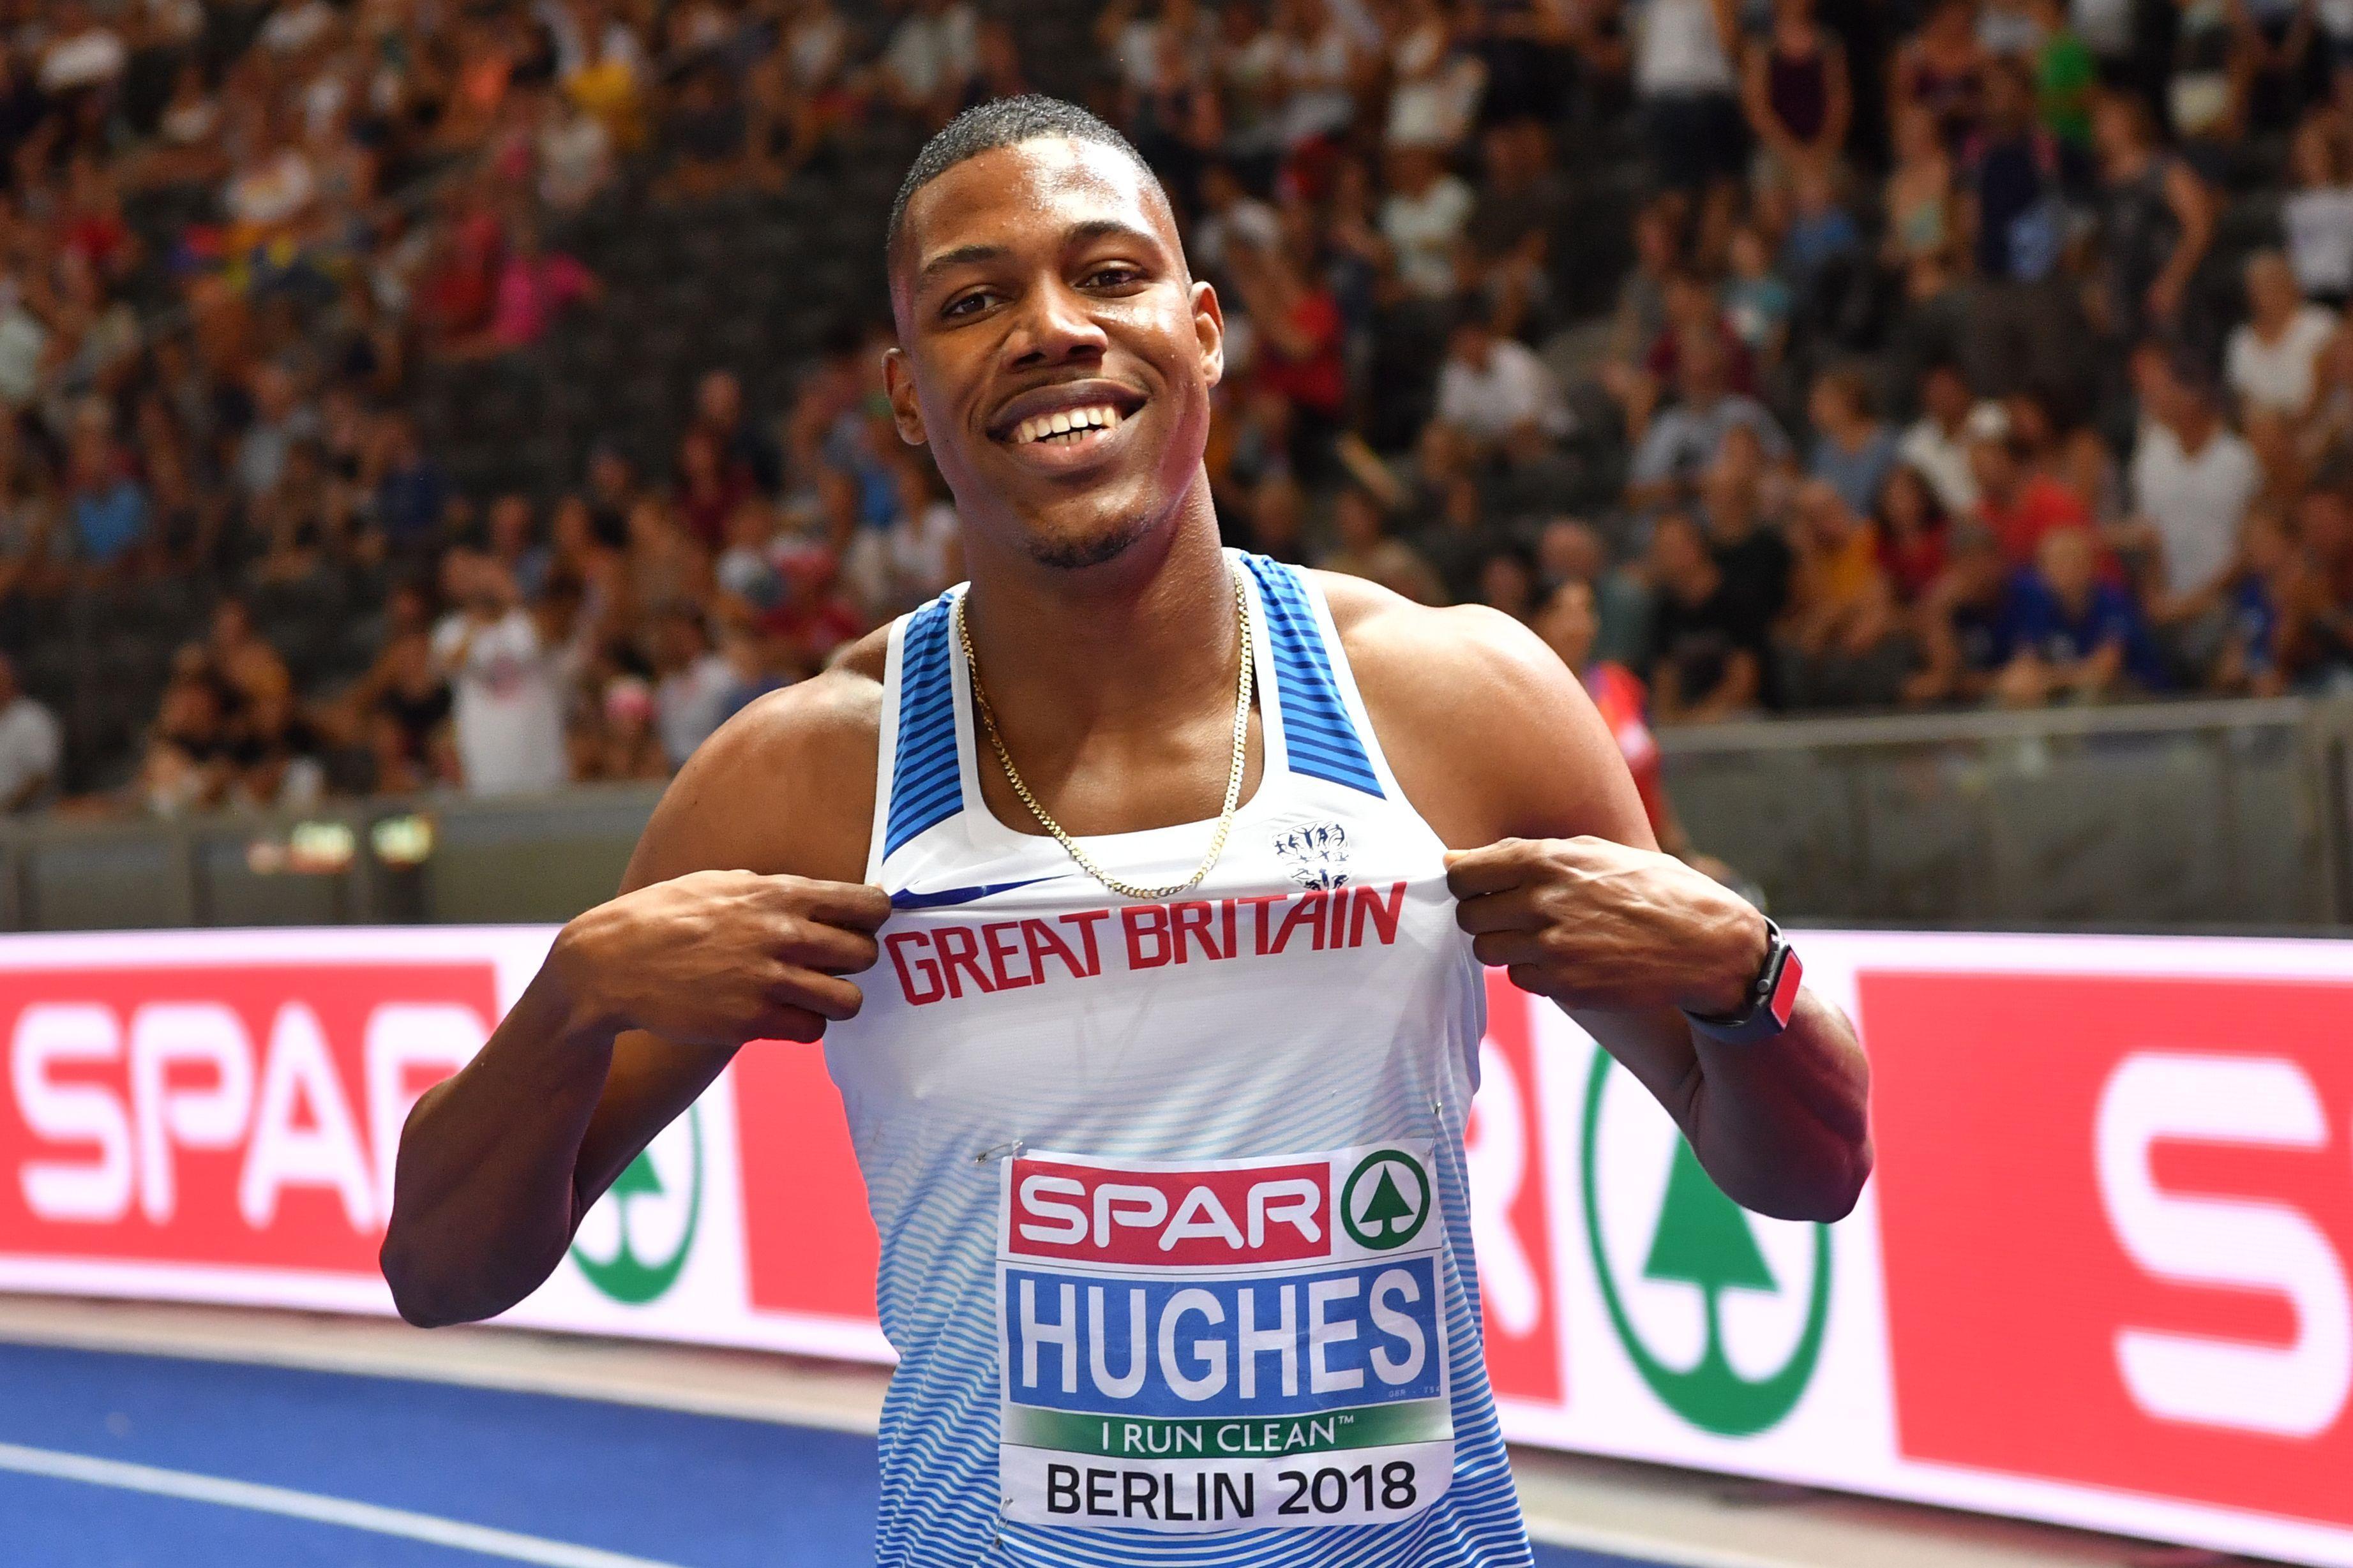 Zharnel Hughes celebrates winning European 100m gold for Great Britain